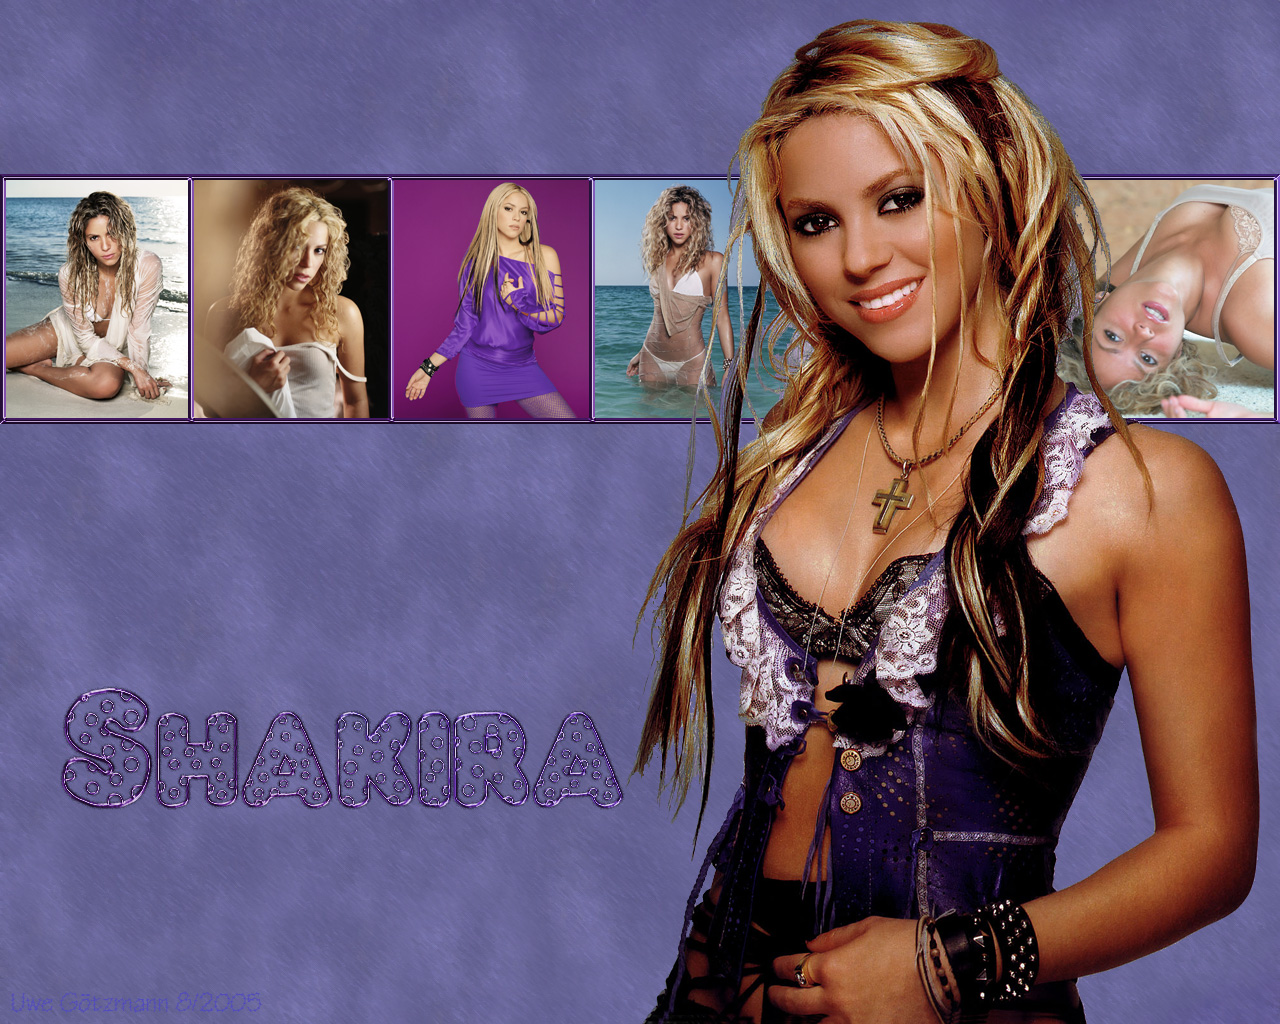 http://4.bp.blogspot.com/-JePYTKT5DoM/Tm2iC3CObeI/AAAAAAAAAEU/-LMj7ikObKM/s1600/Shakira+%25283%2529.jpg